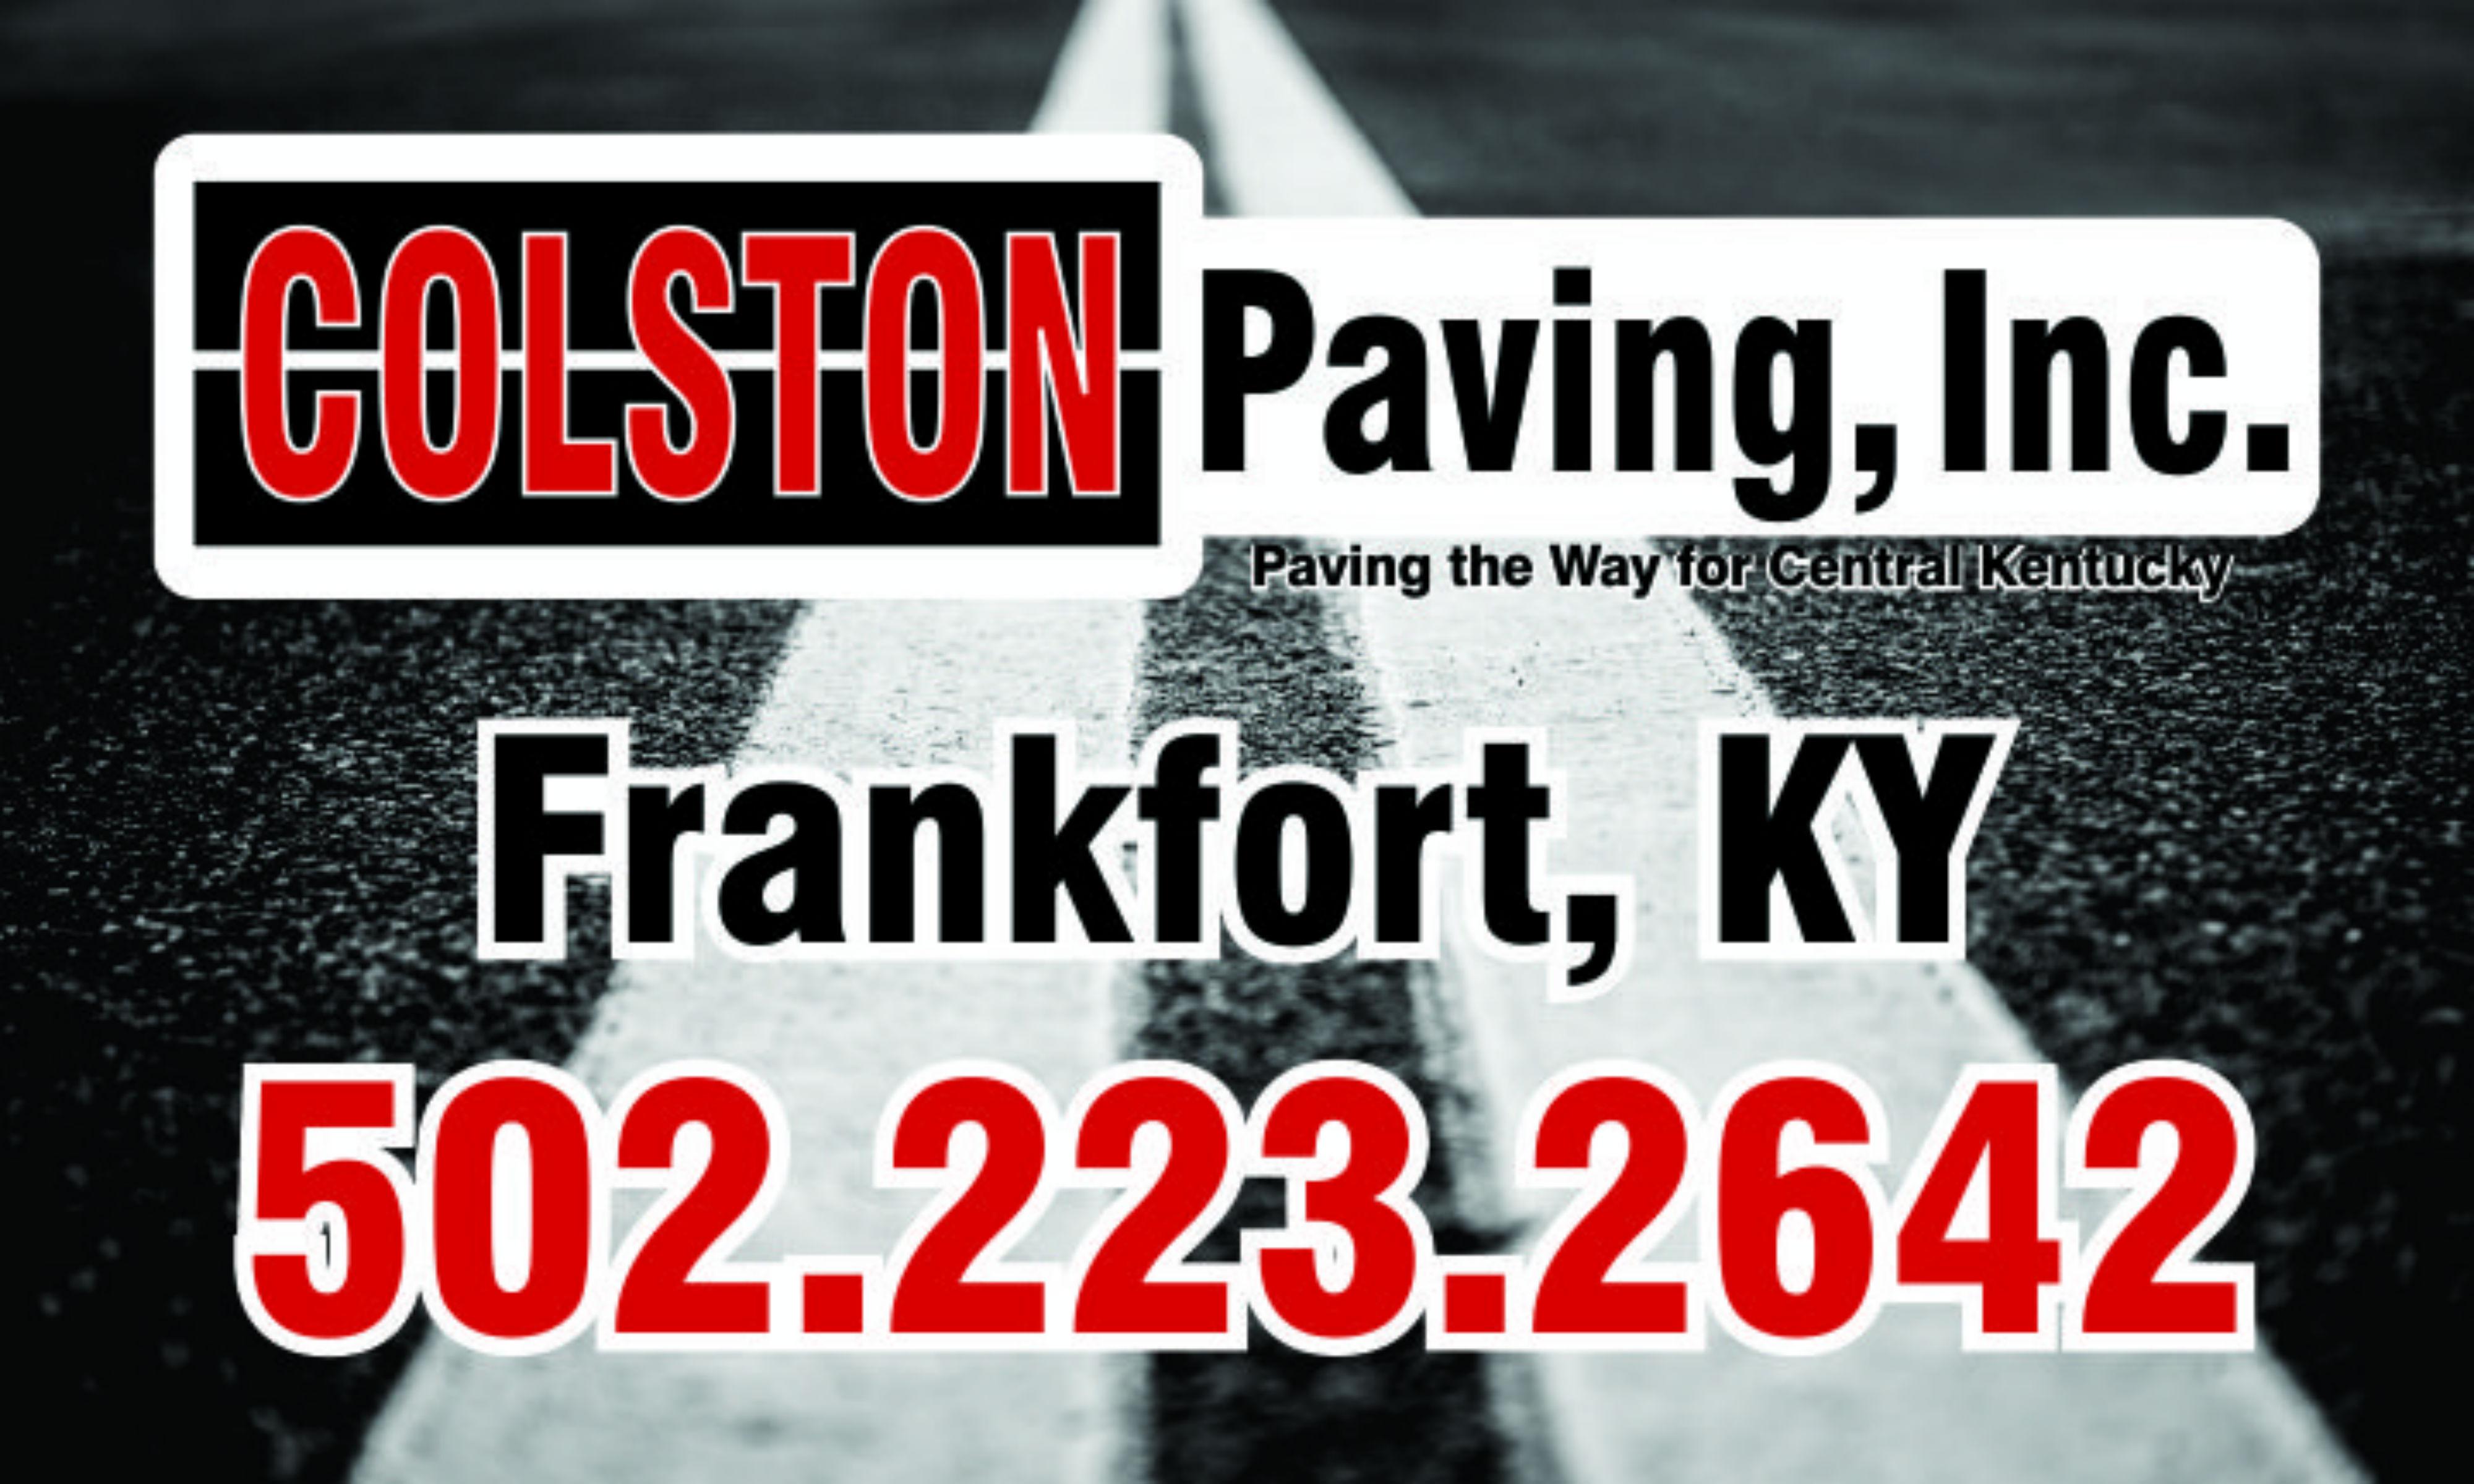 Colston paving 3x5